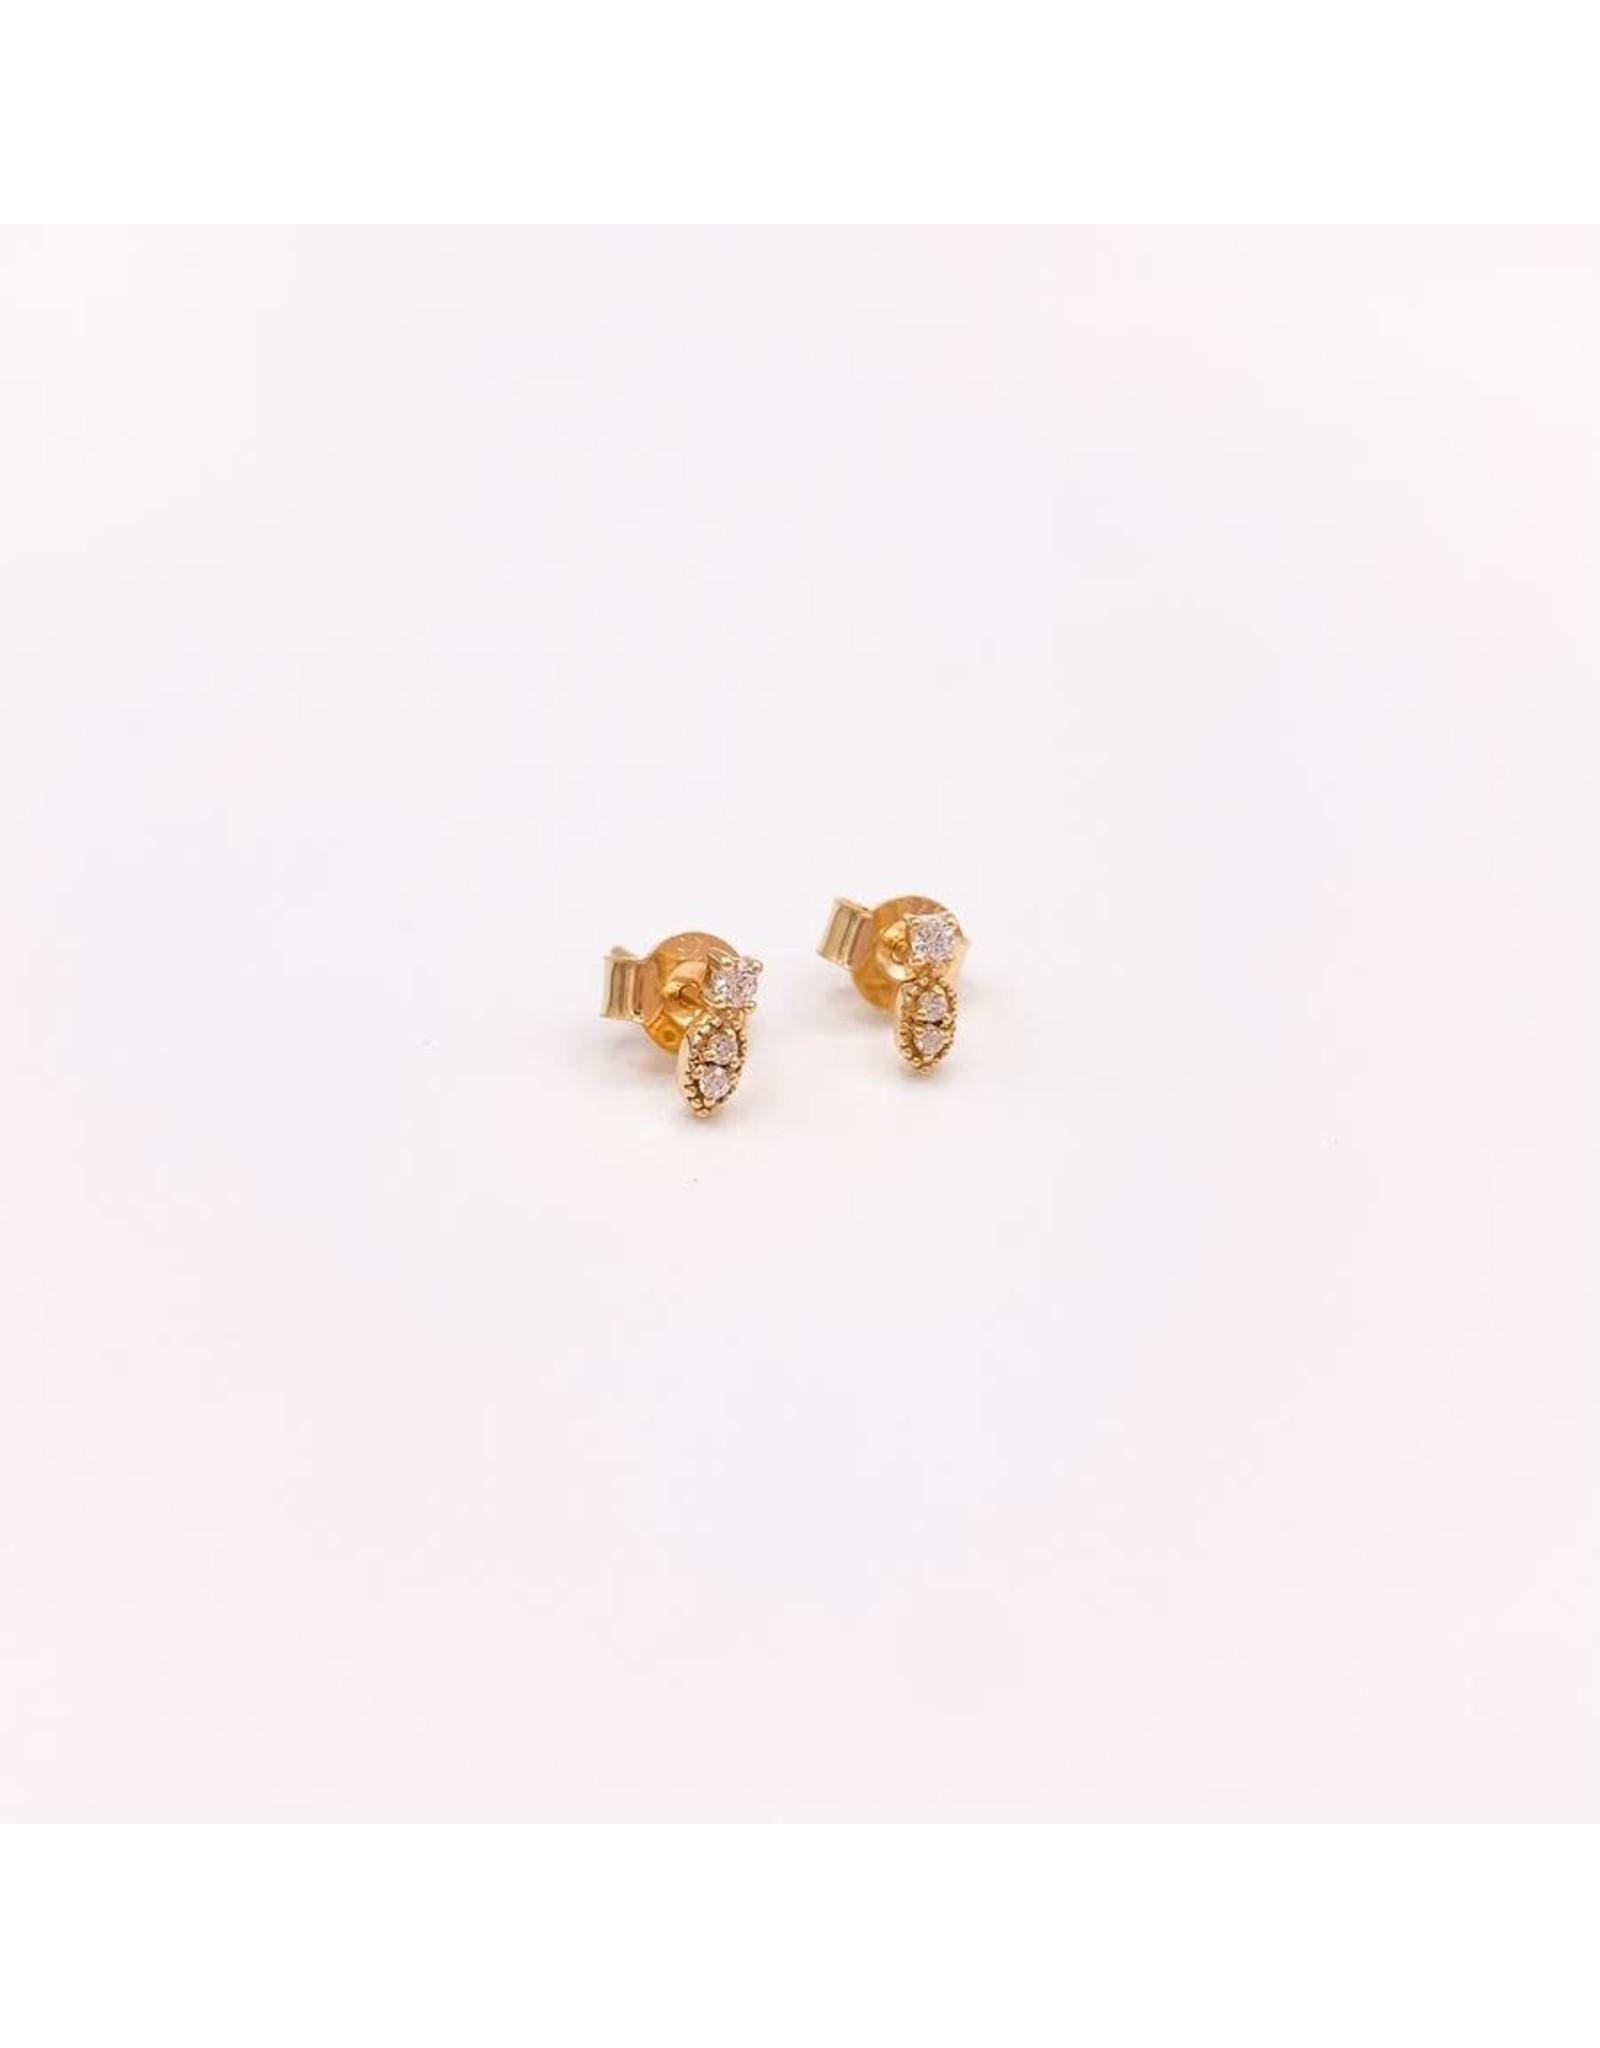 Jewelry By Amanda Gold Romeo Studs - Earrings